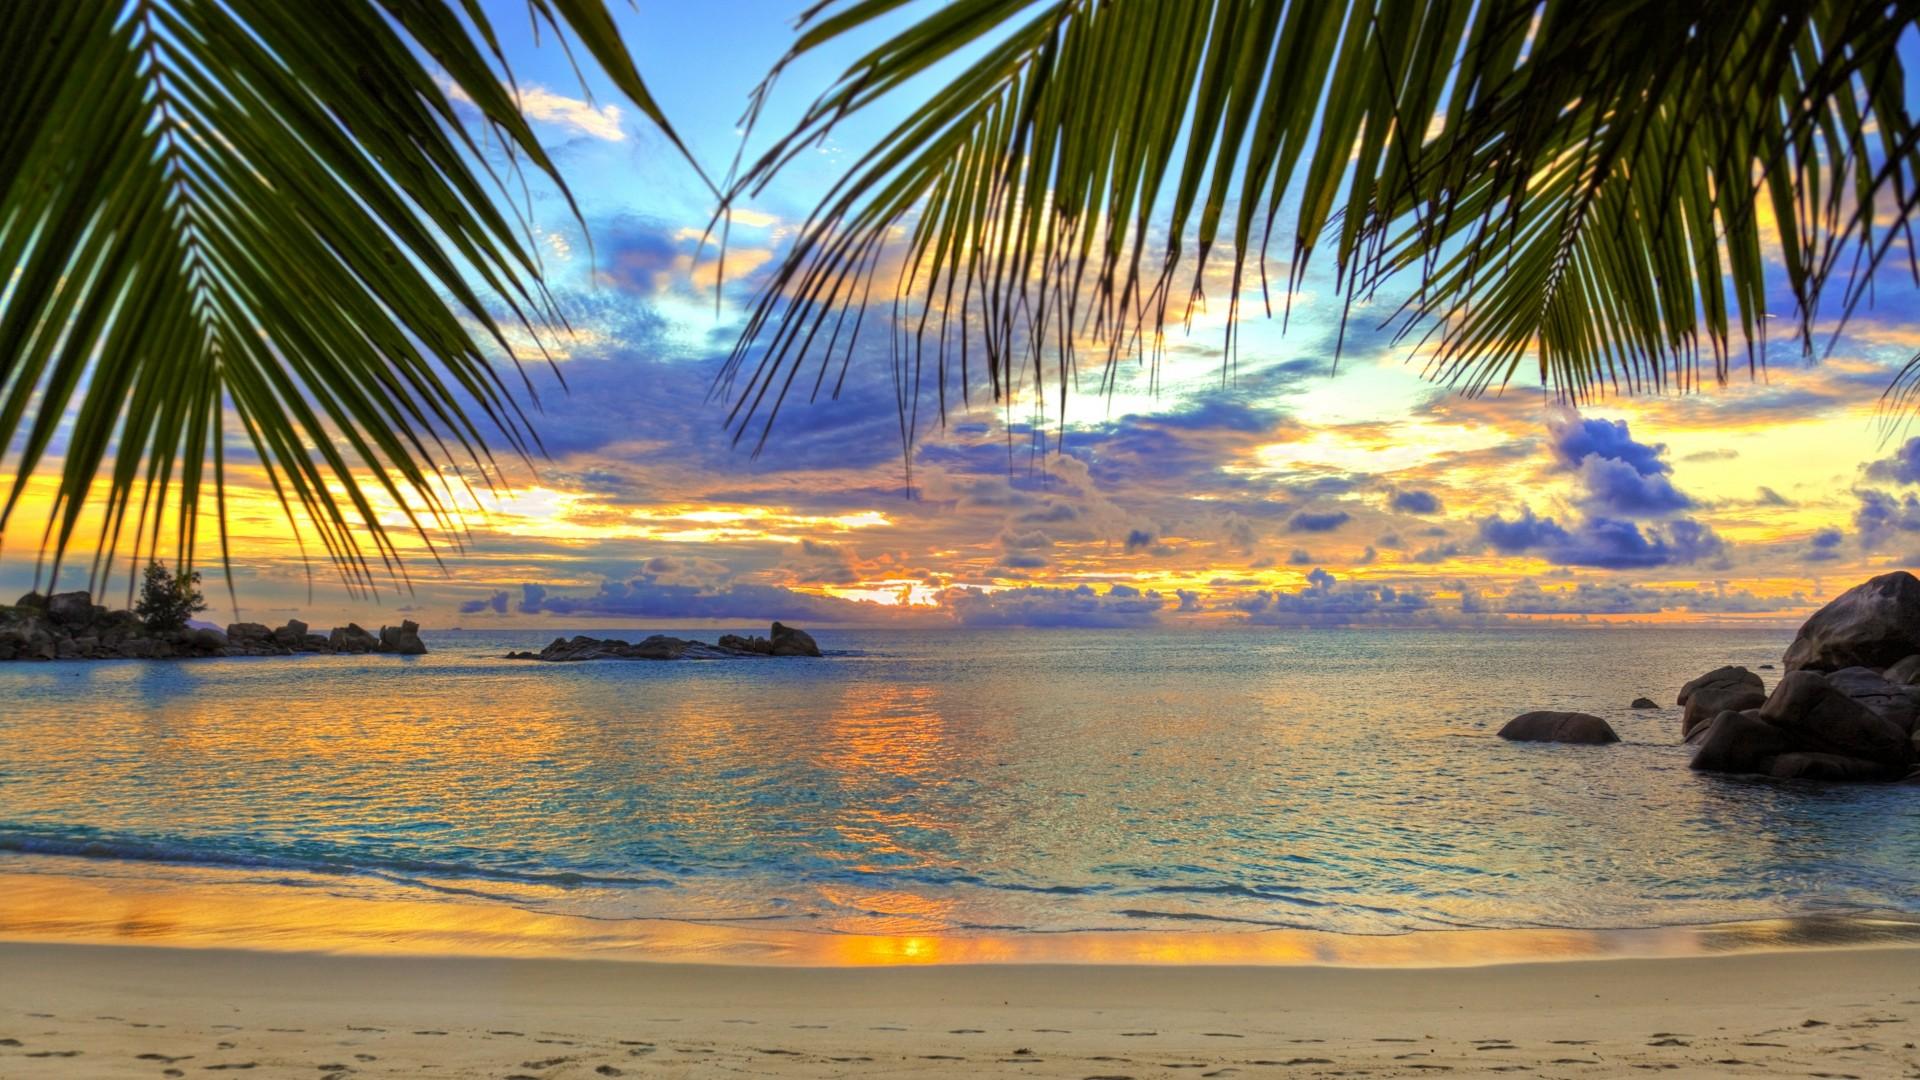 Preview wallpaper beach, tropics, sea, sand, palm trees 1920×1080